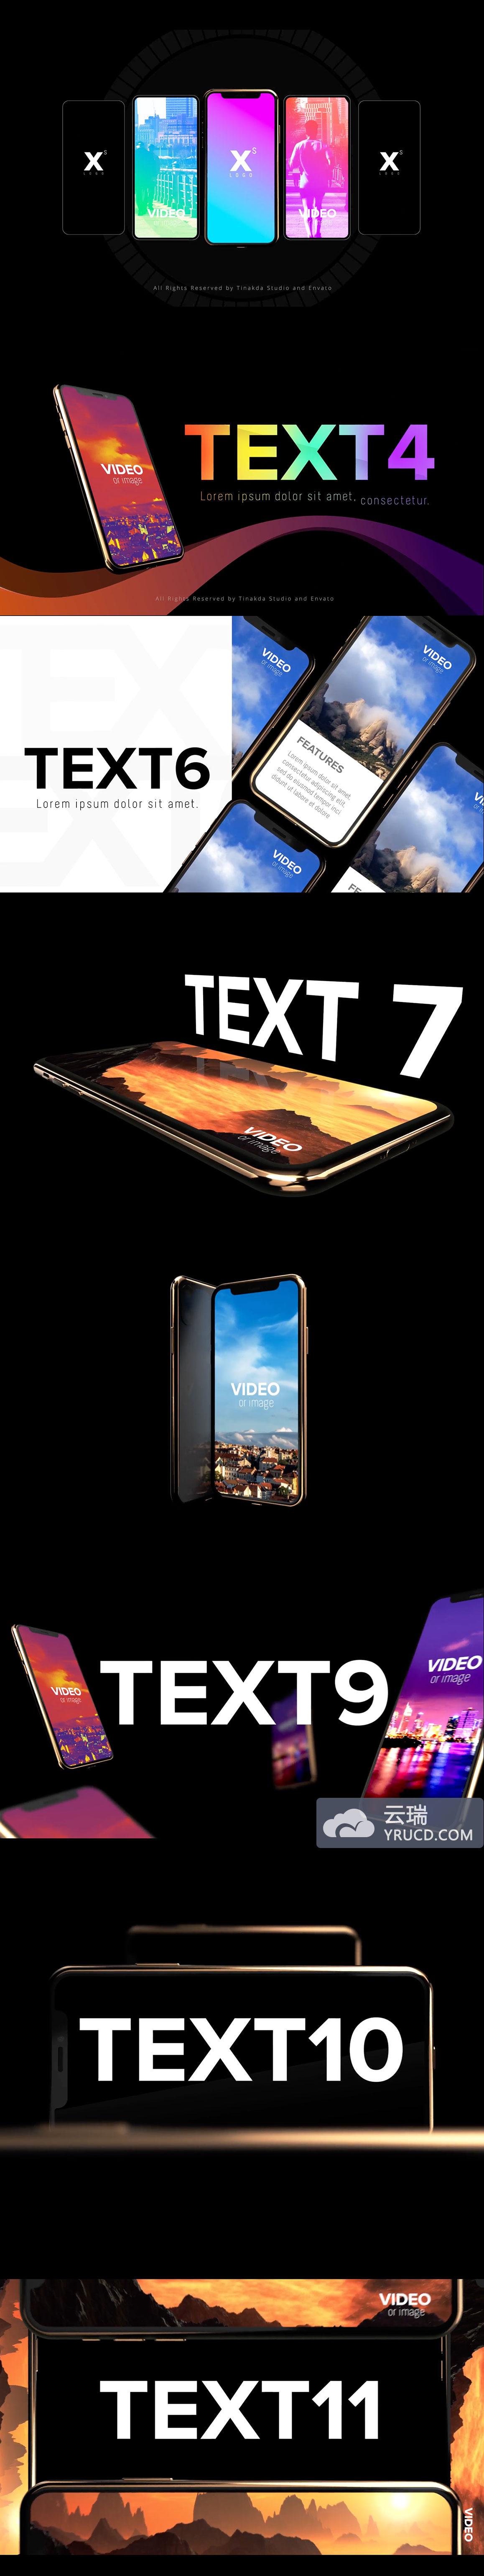 iPhone Xs App 广告多角度手机样机AE模板下载 [AEP]